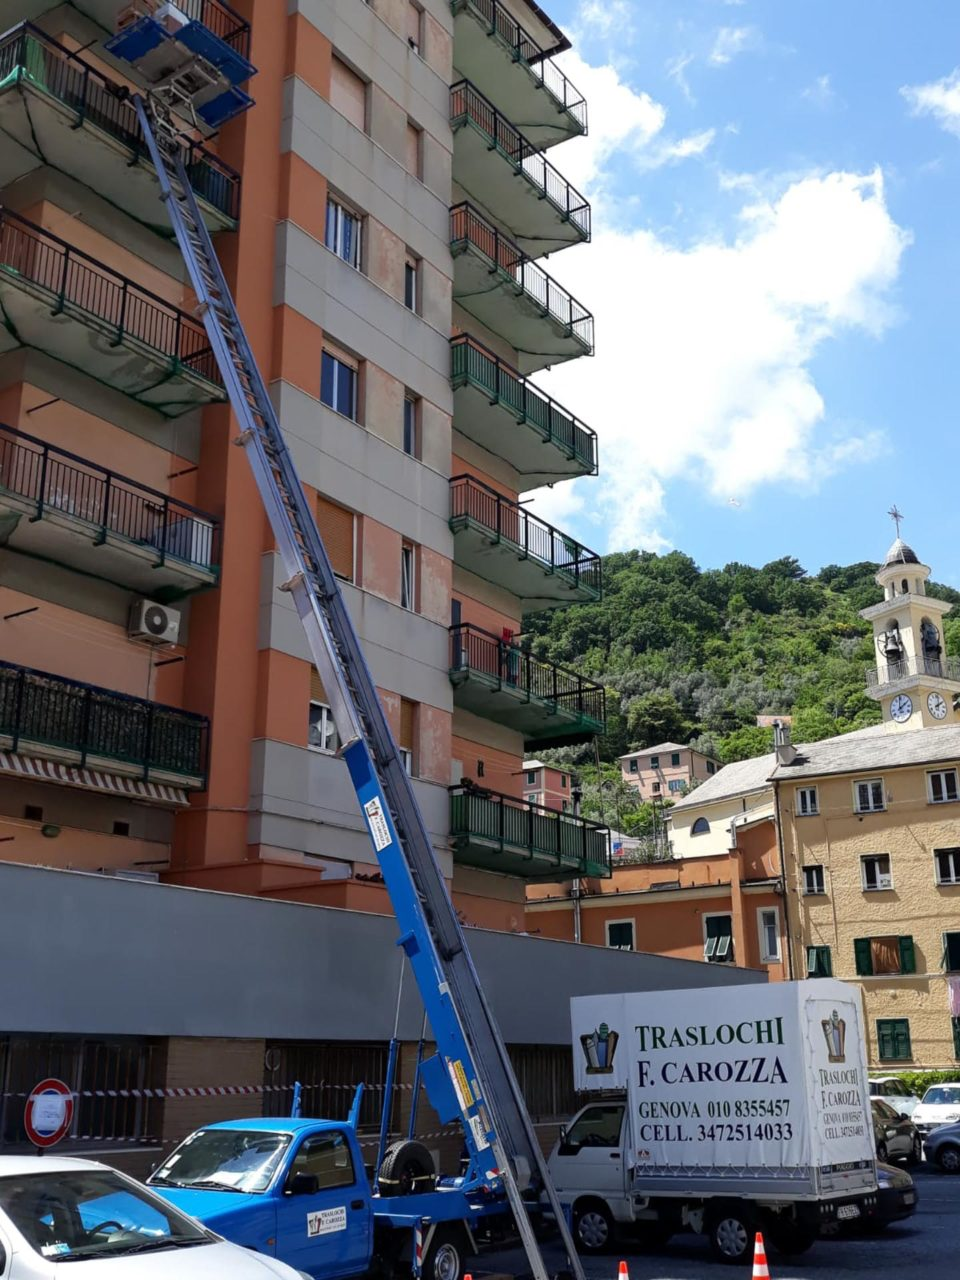 Traslochi Carozza Fiorenzo Genova-4